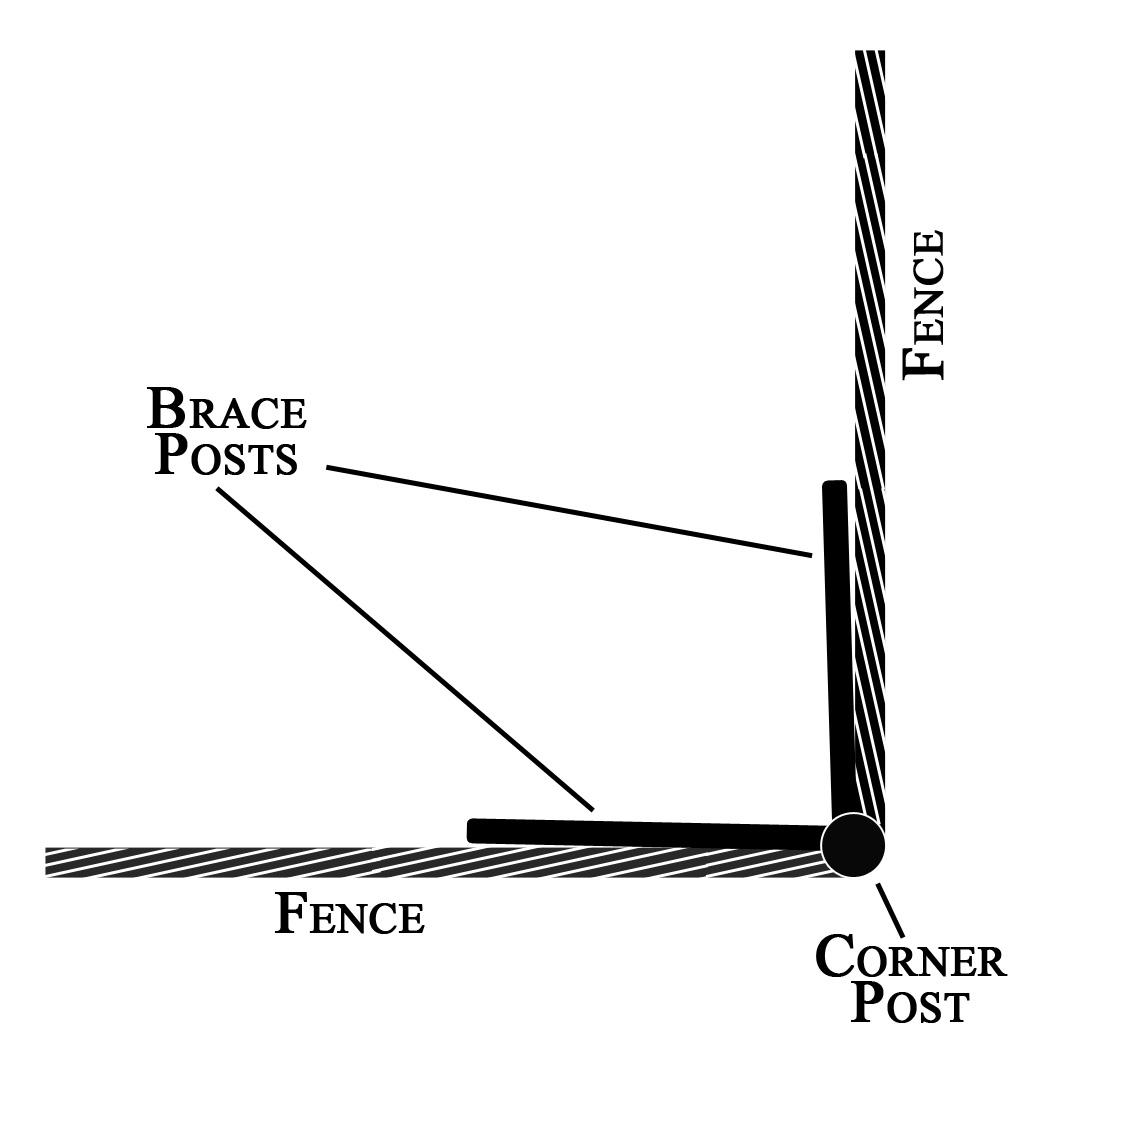 braceposts.jpg